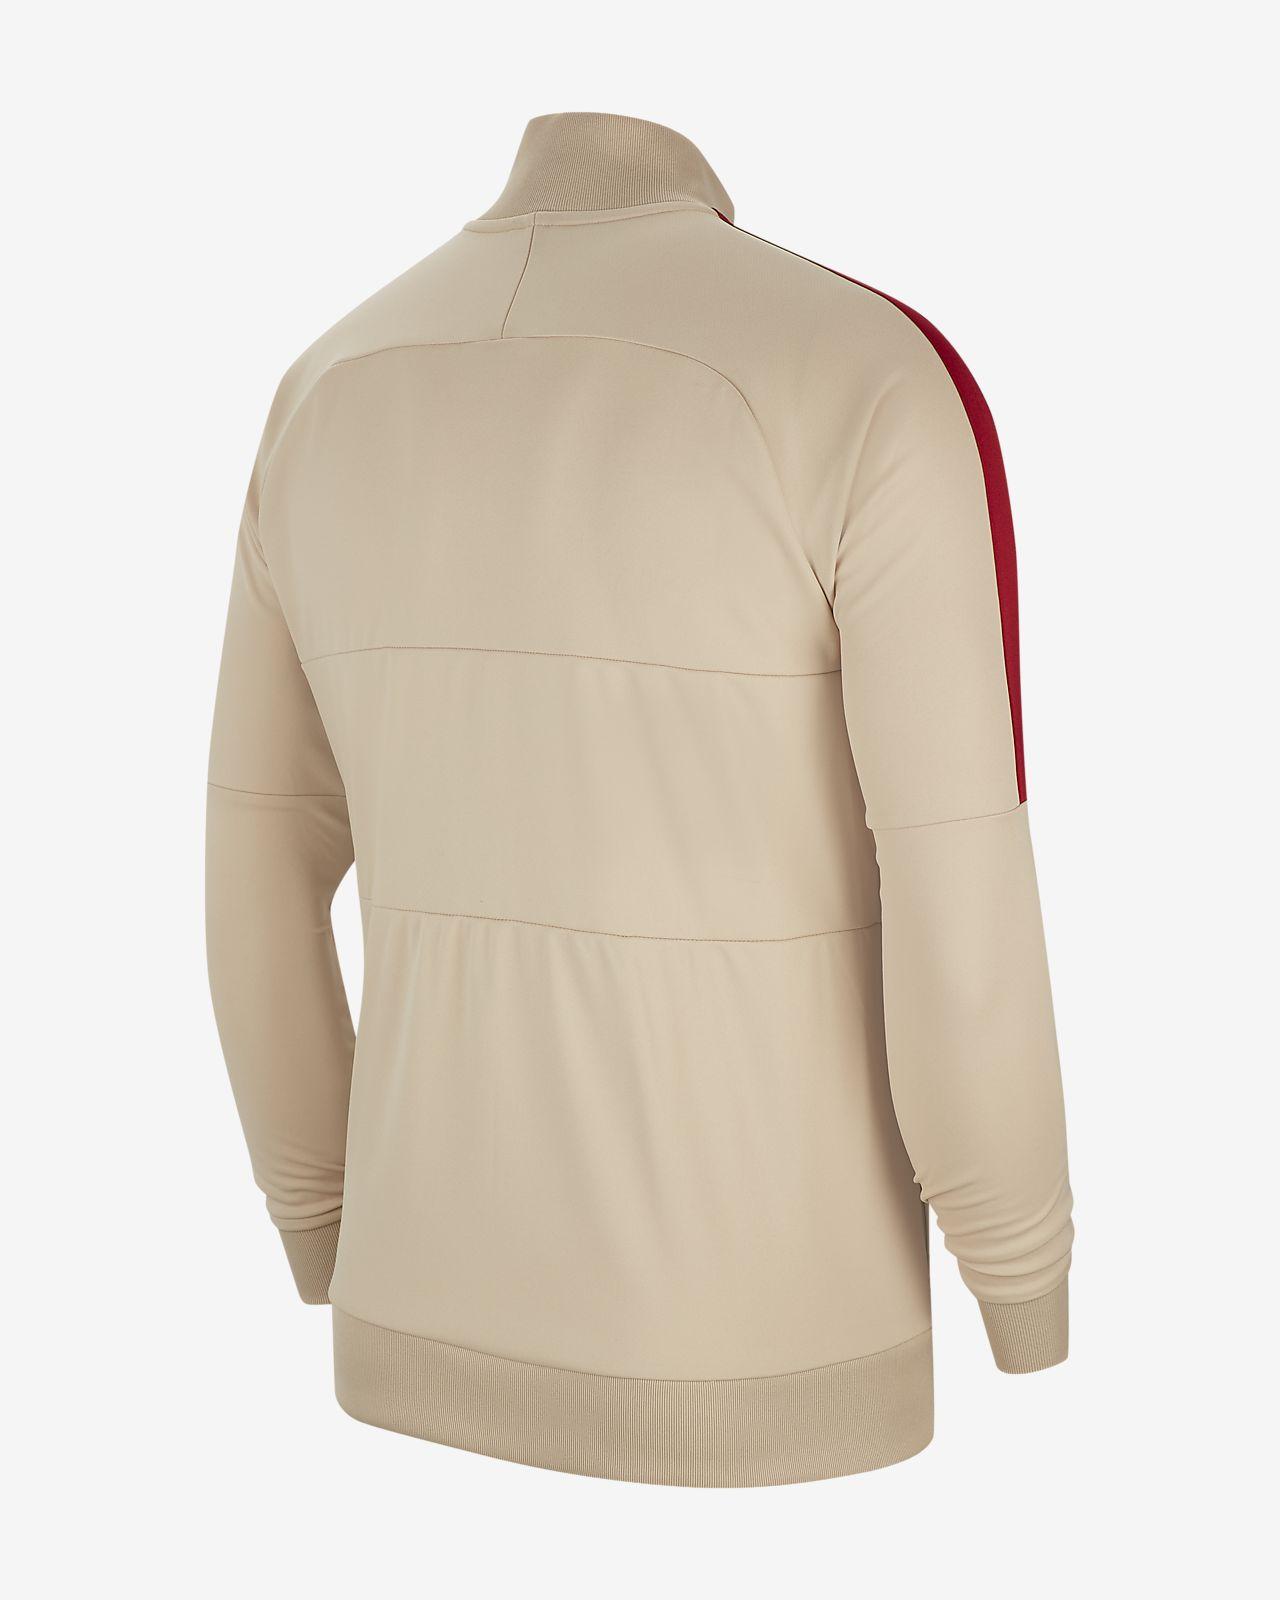 fc1e2926 Galatasaray-jakke til mænd. Nike.com DK